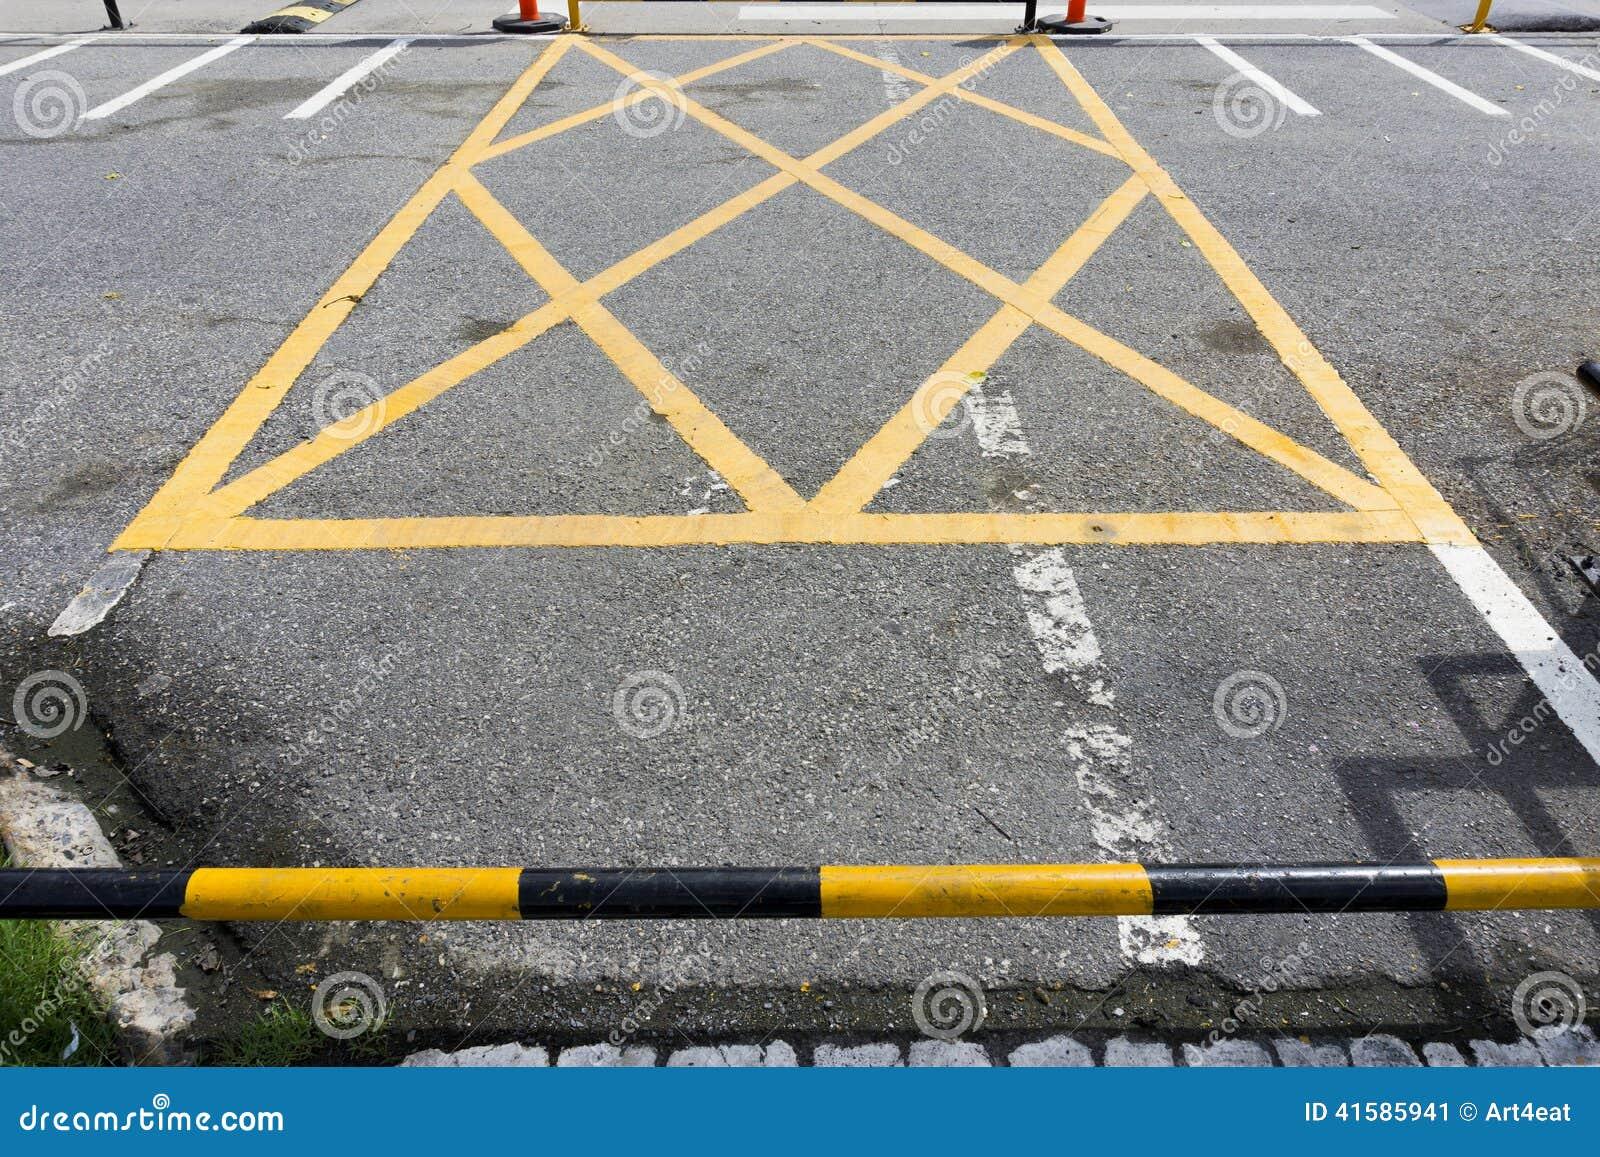 Symbol In Car Park Stock Image Image Of Park Traffic 41585941